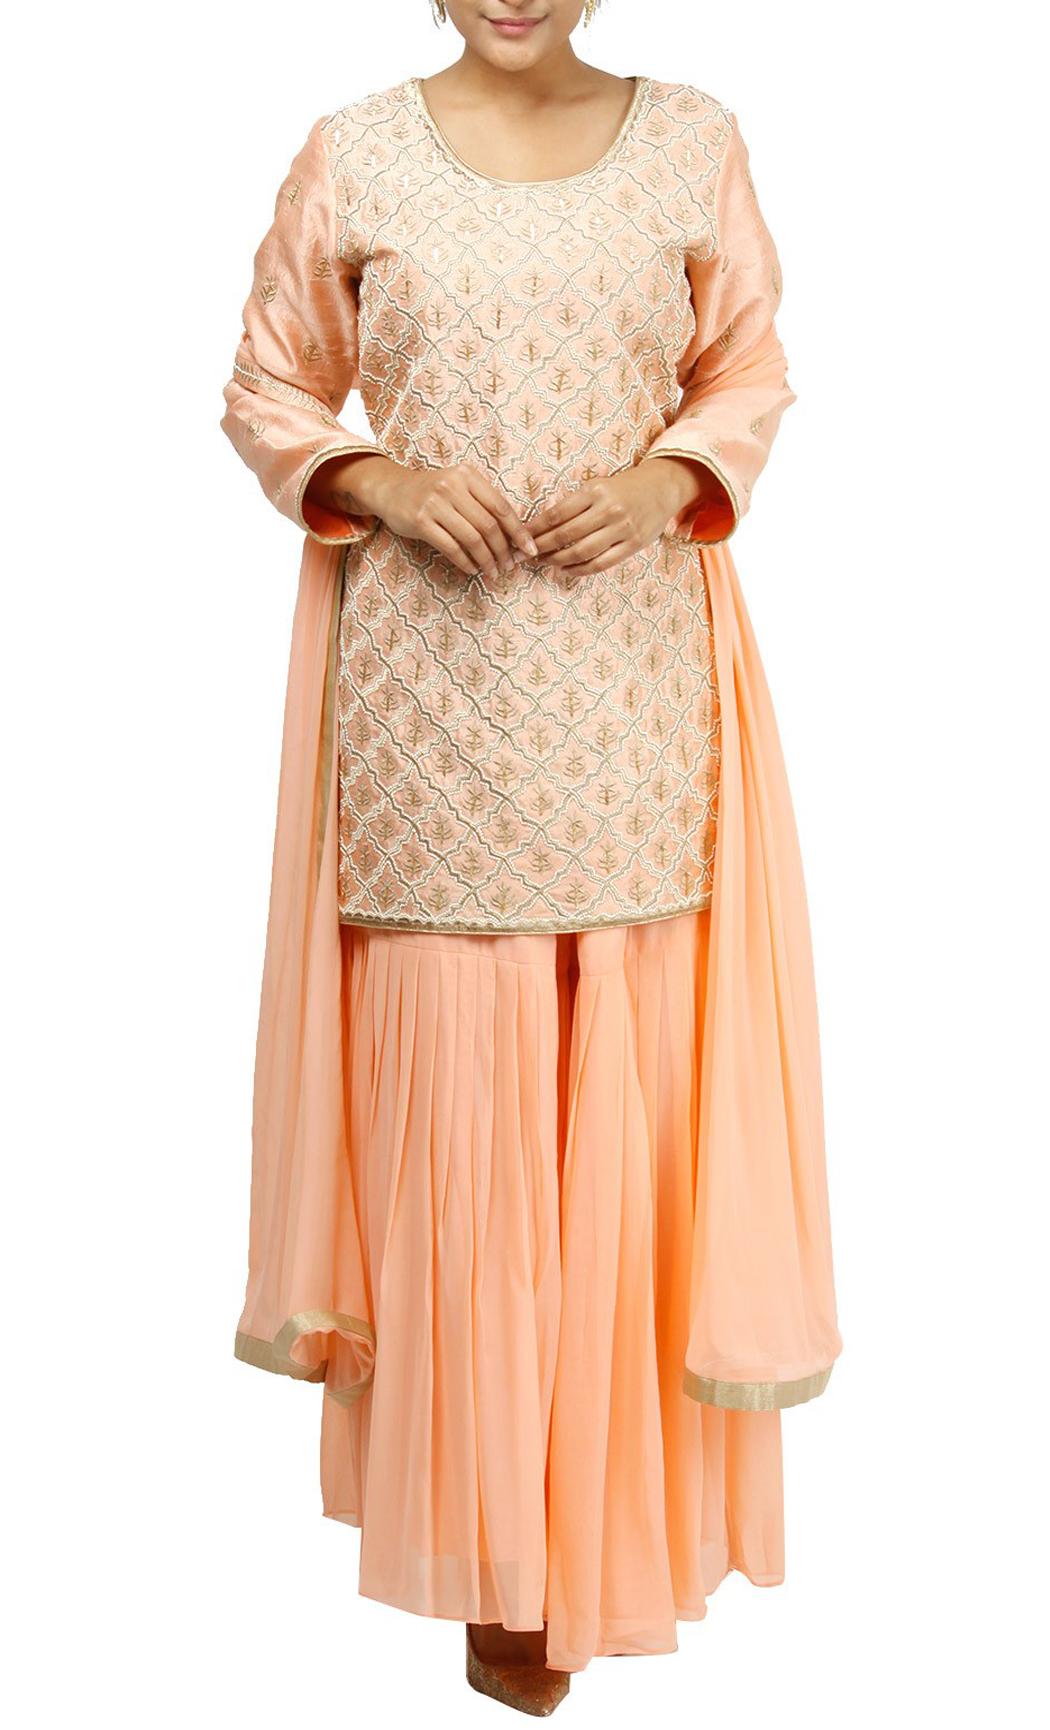 Peach Embroidered Short Kurta and Sharara Set - Buy Online